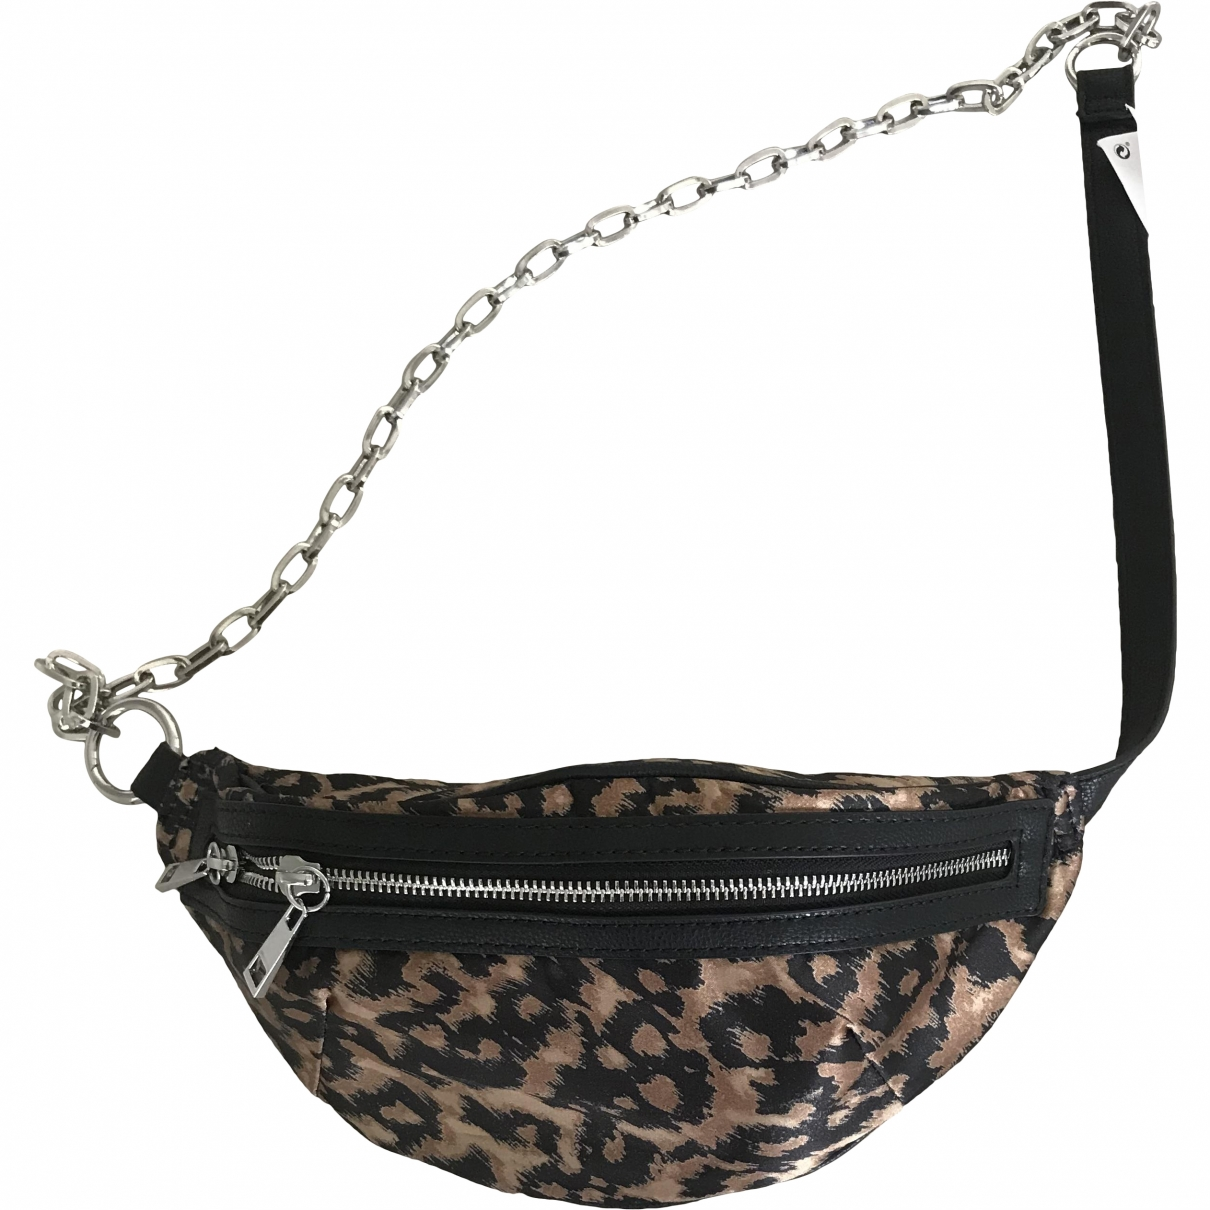 Zara \N belt for Women M International